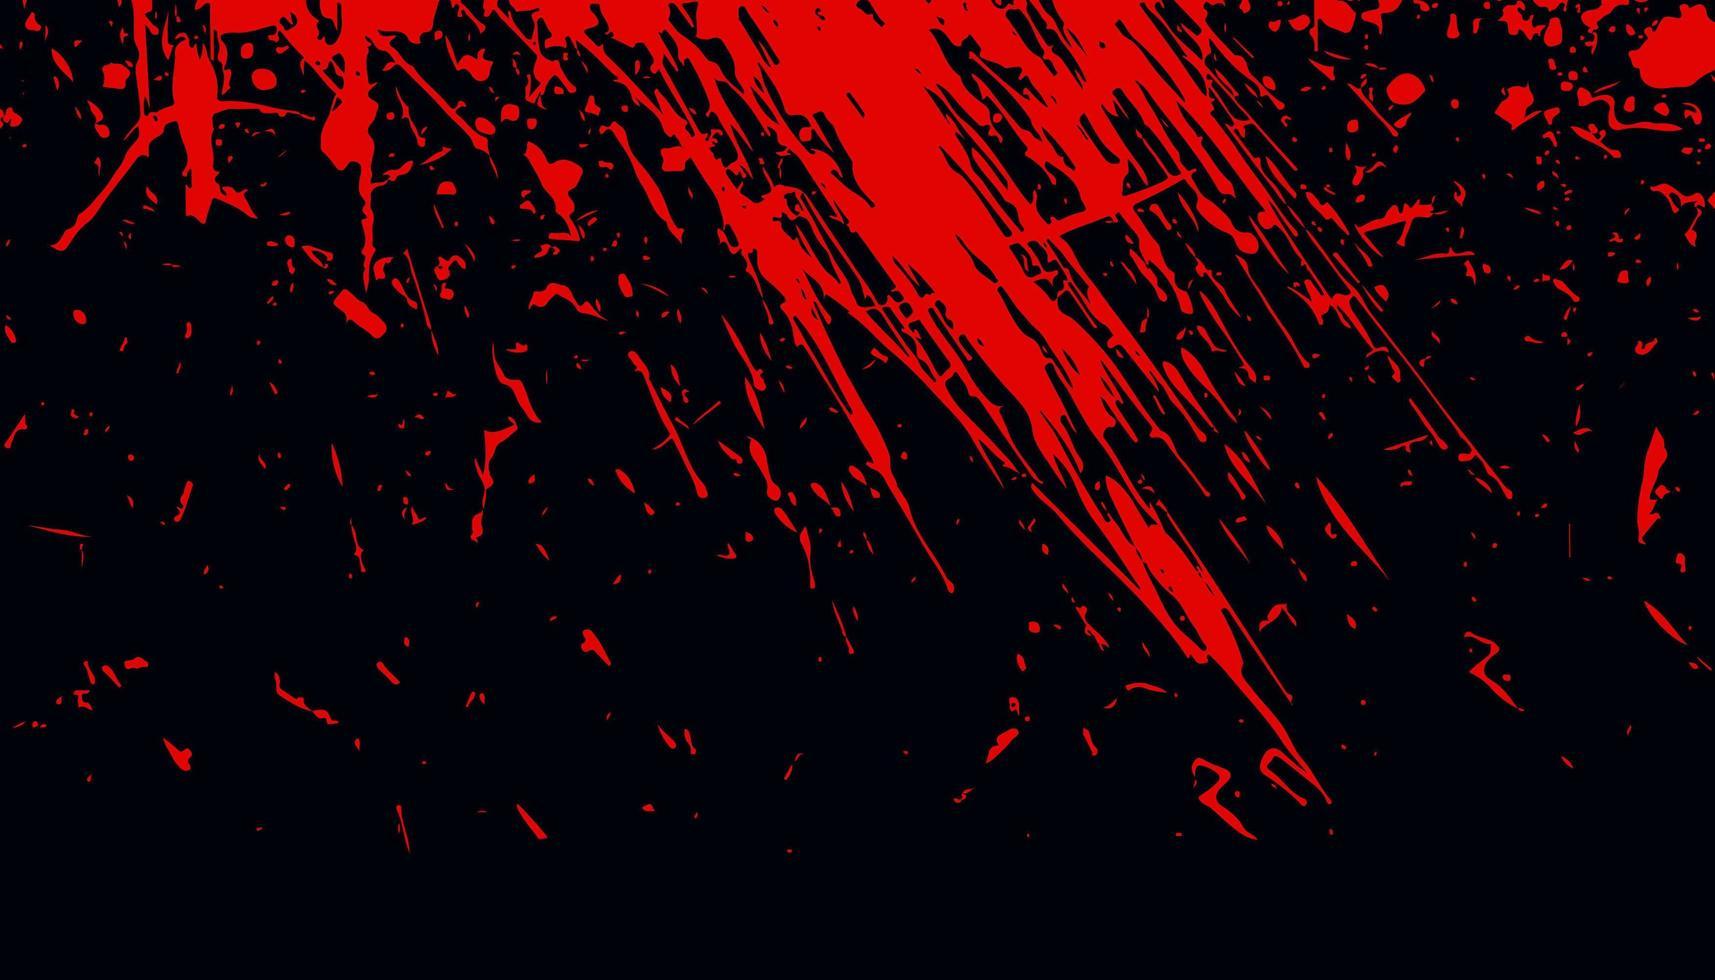 blodig röd grunge abstrakt textur bakgrund vektor